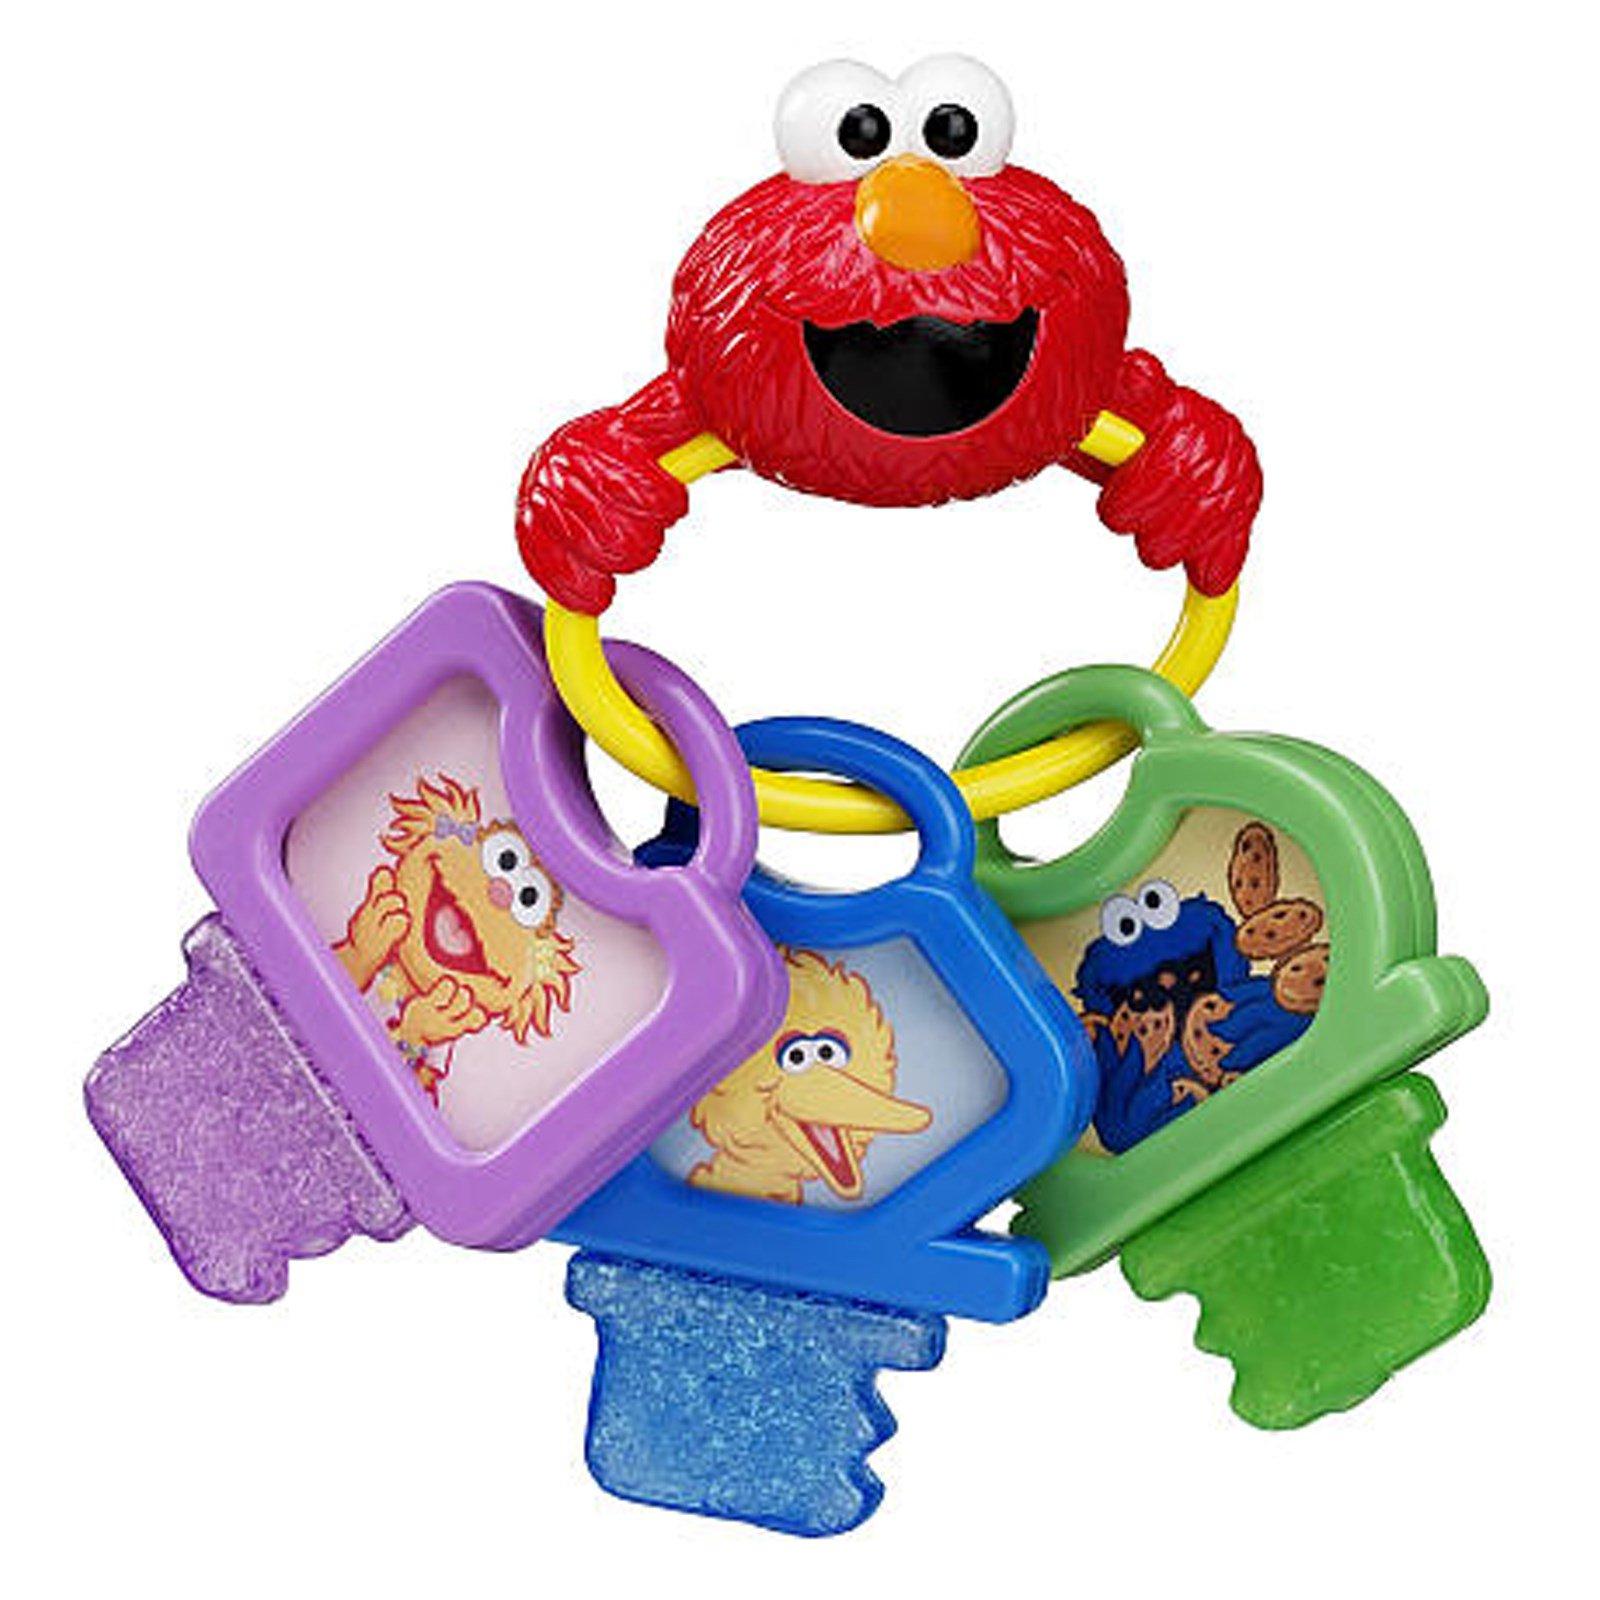 Munchkin Sesame Street y Keys Teether 6 Months iHerb